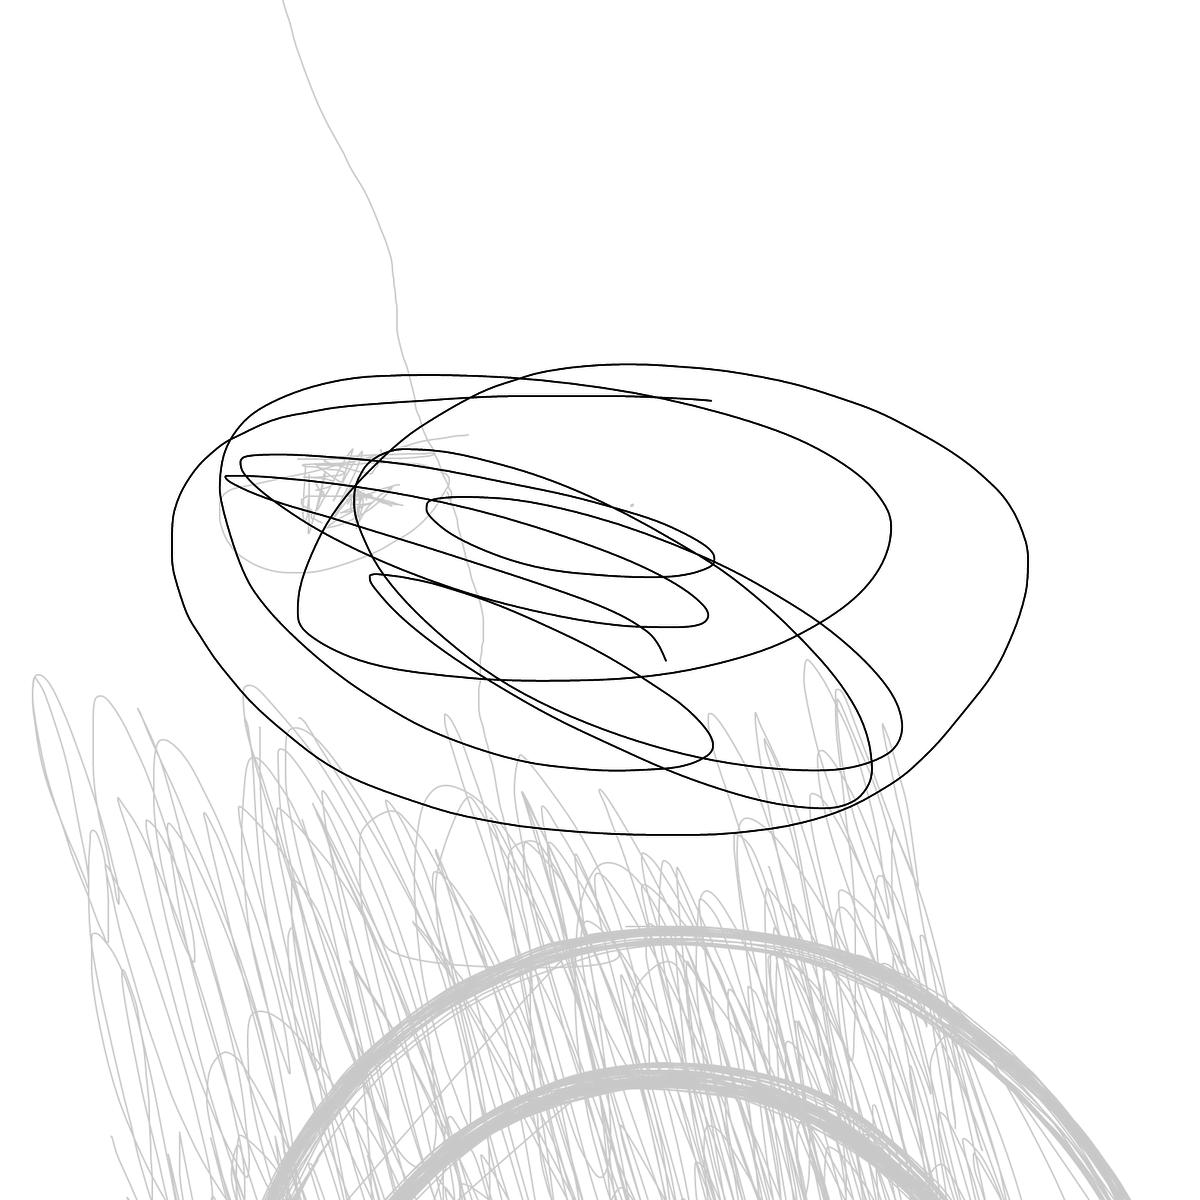 BAAAM drawing#9064 lat:52.4885368347168000lng: 13.4249315261840820